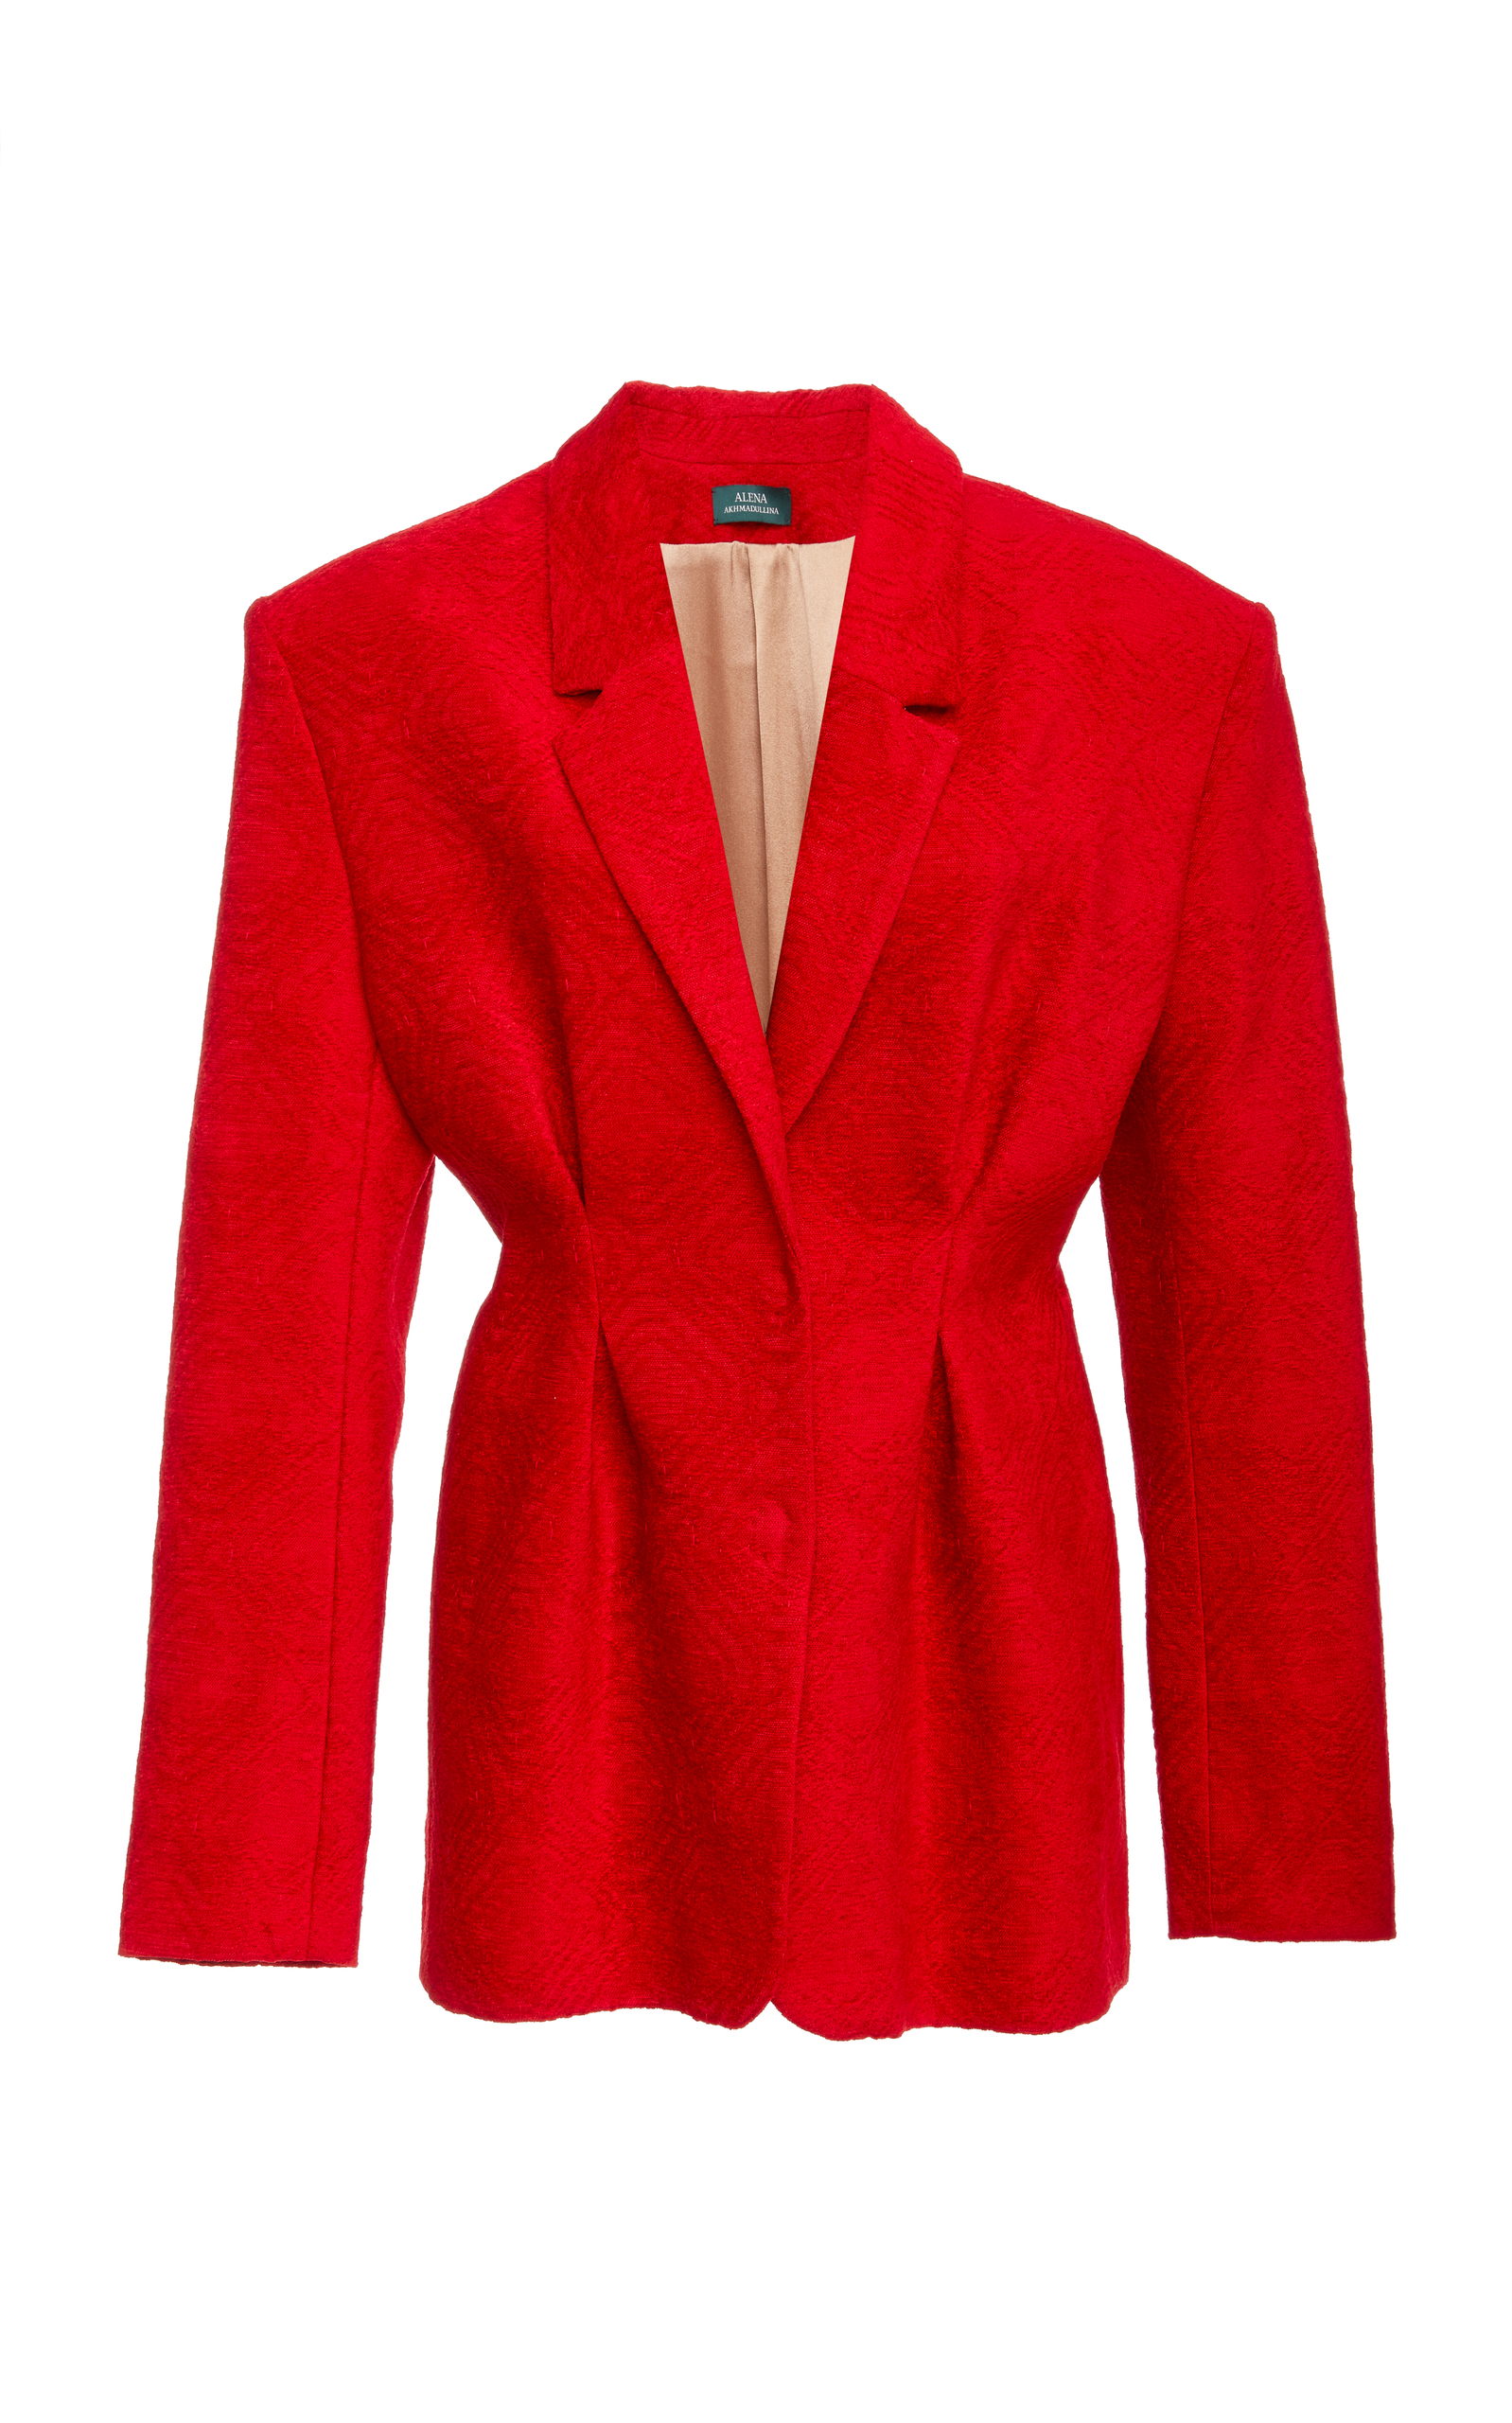 ALENA AKHMADULLINA Tailored Blazer in Red